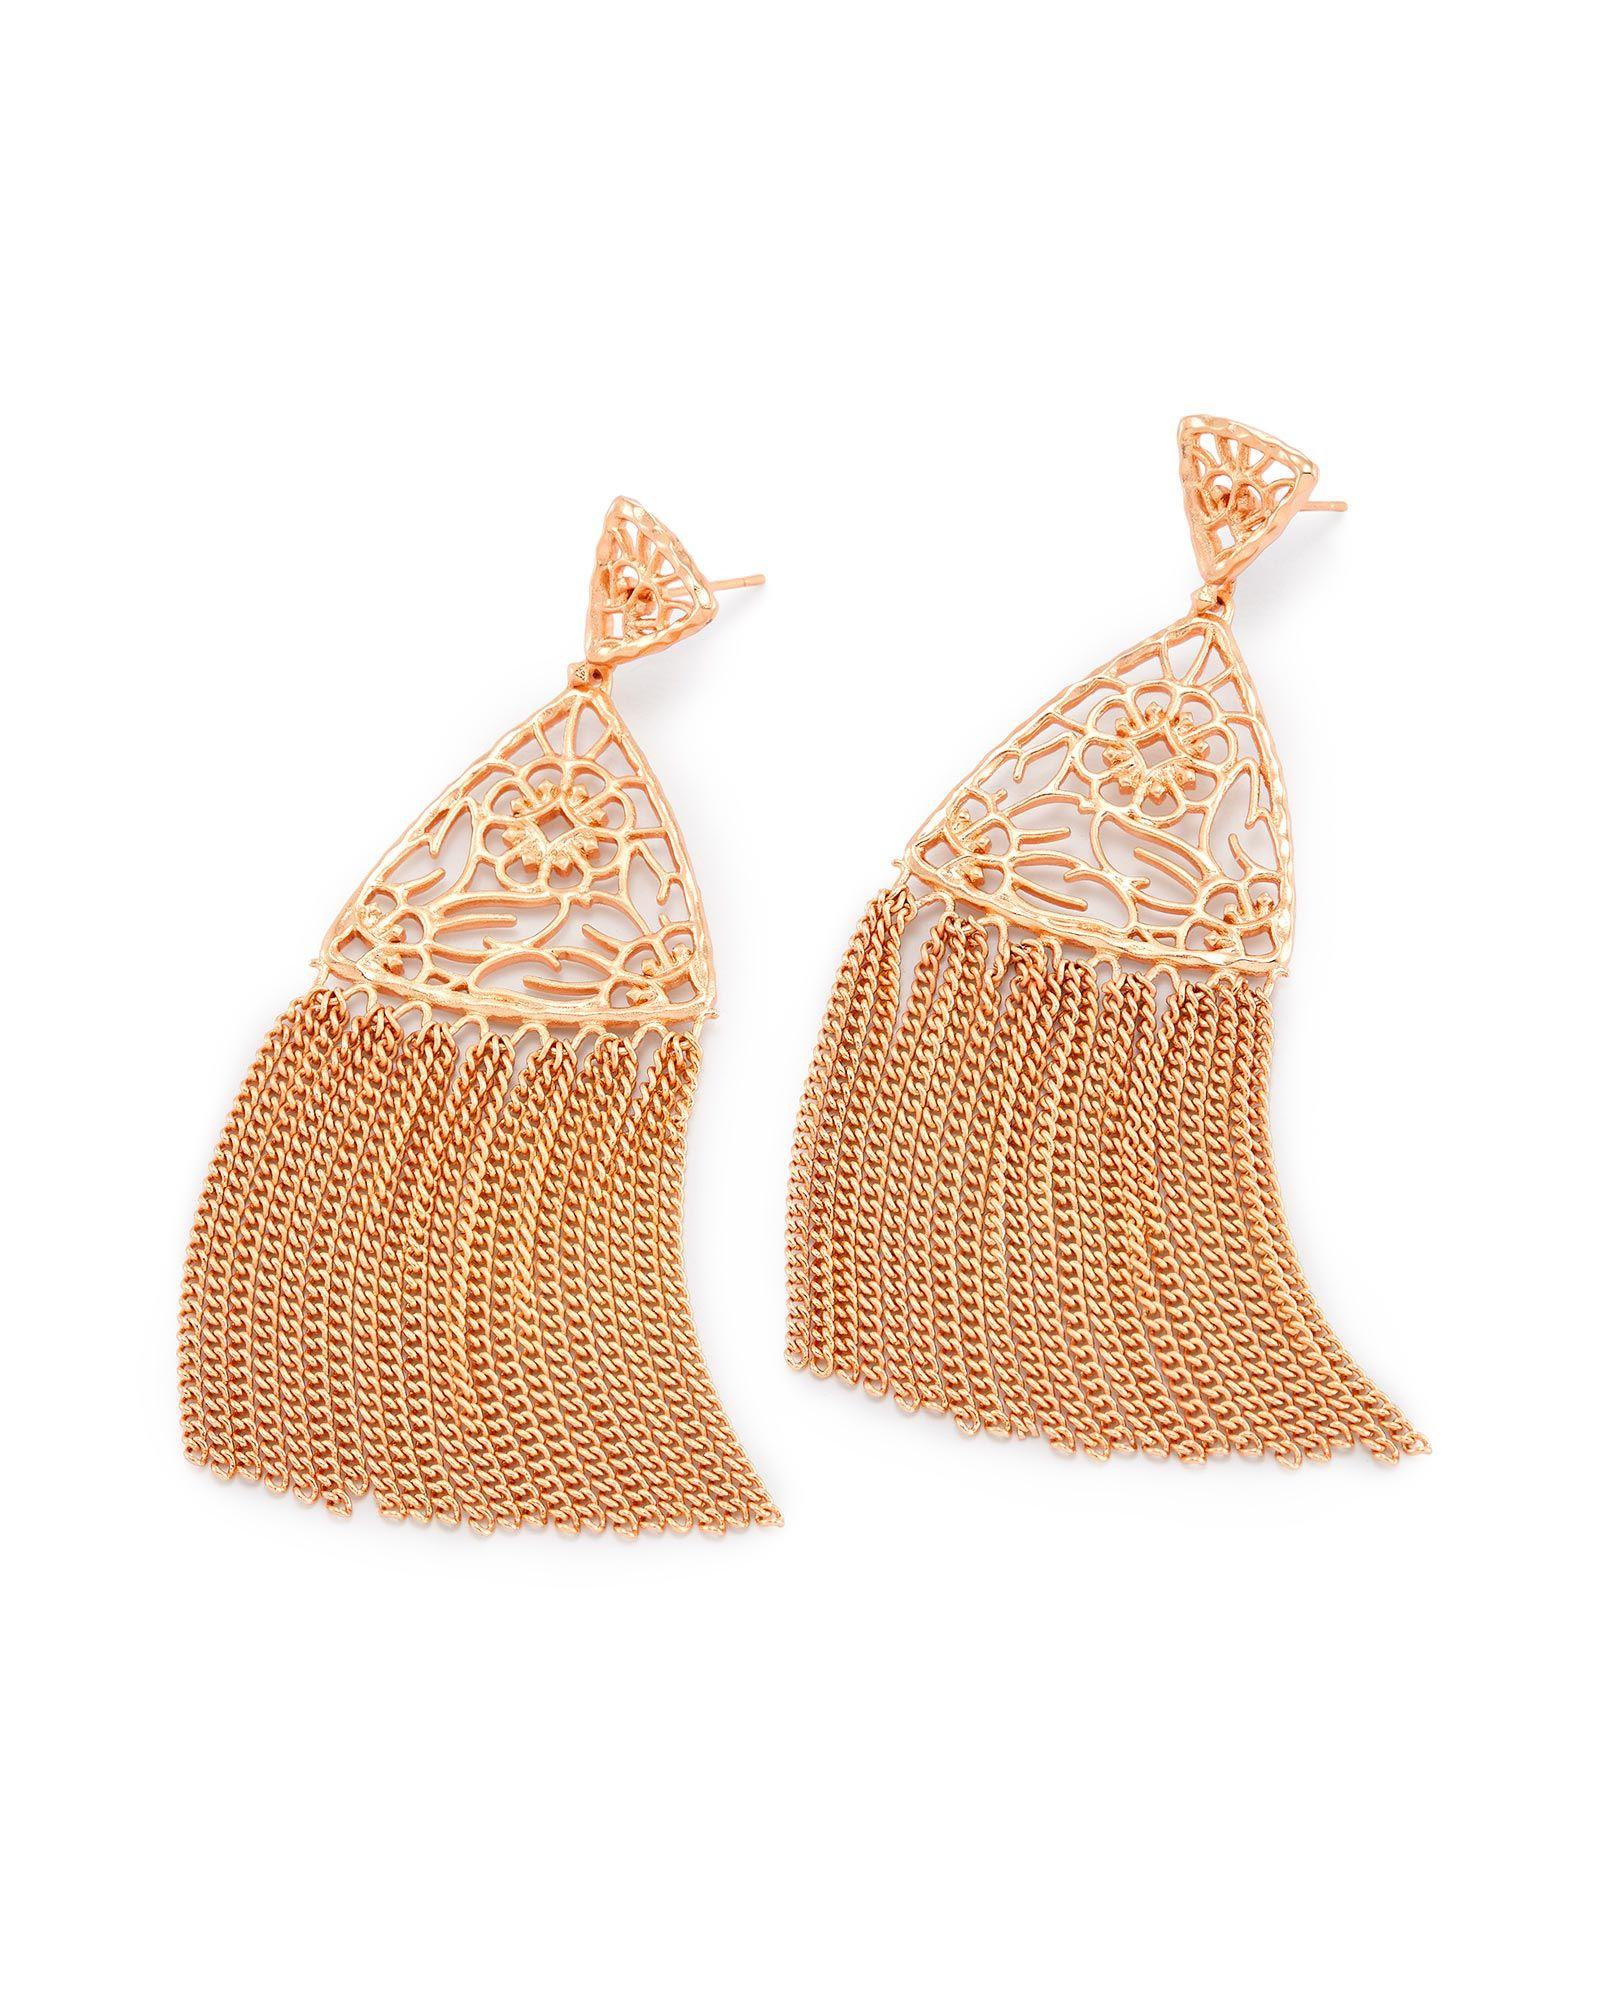 1660d72f5 Sale | Kendra Scott Ana Statement Earrings in Rose Gold | KENDRA ...